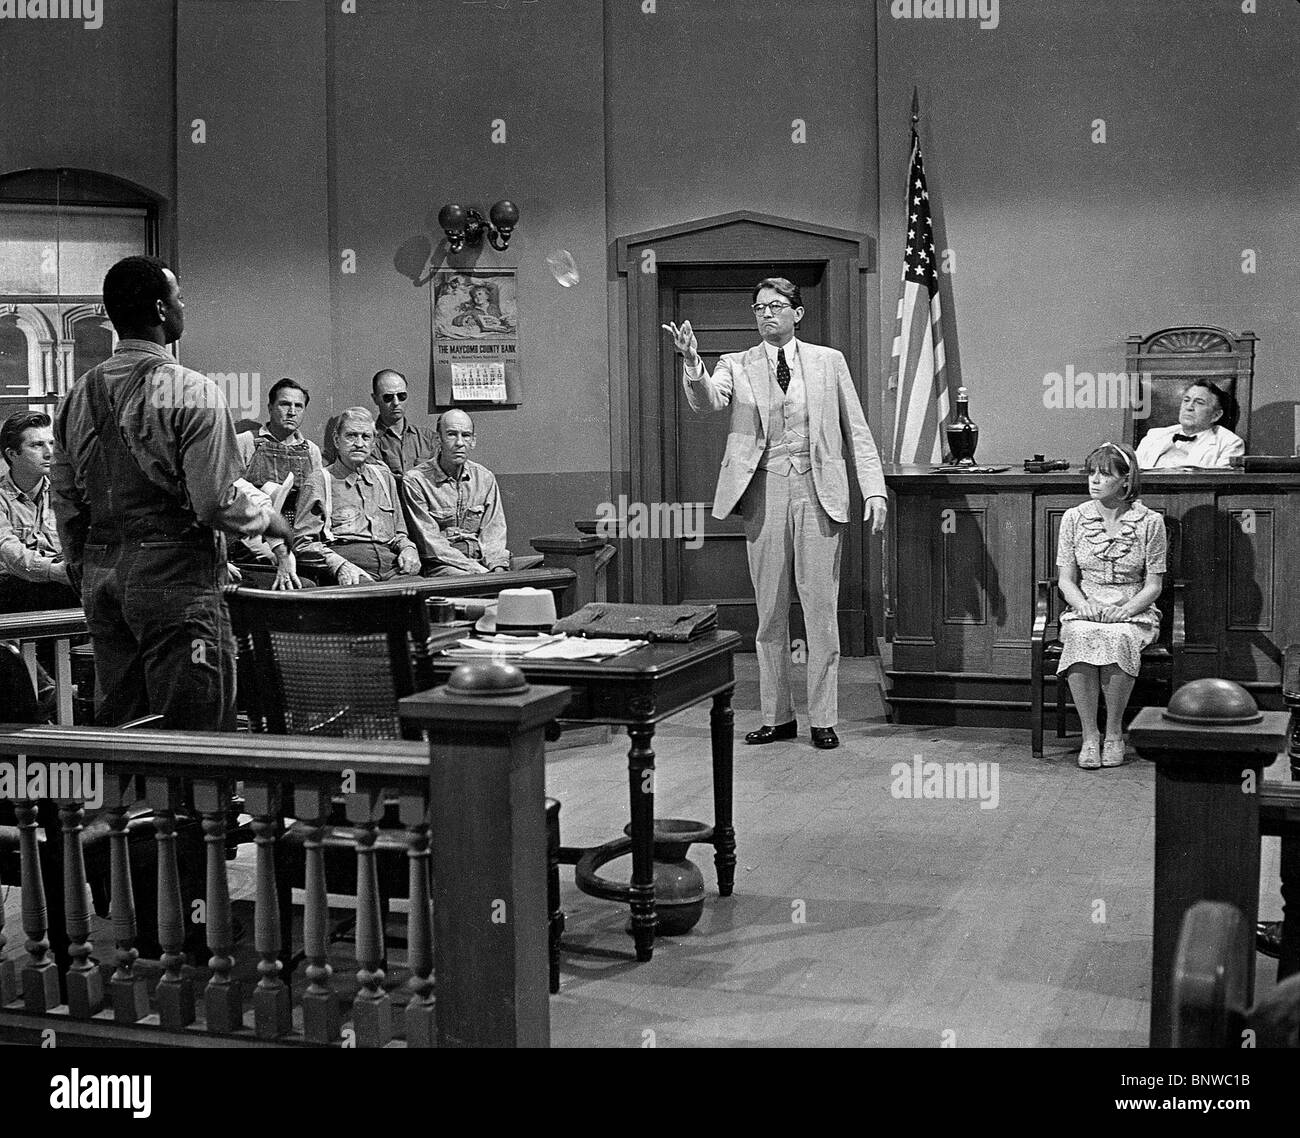 BROCK PETERS, Gregory Peck, ZU TÖTEN, um eine Spottdrossel, 1962 Stockbild